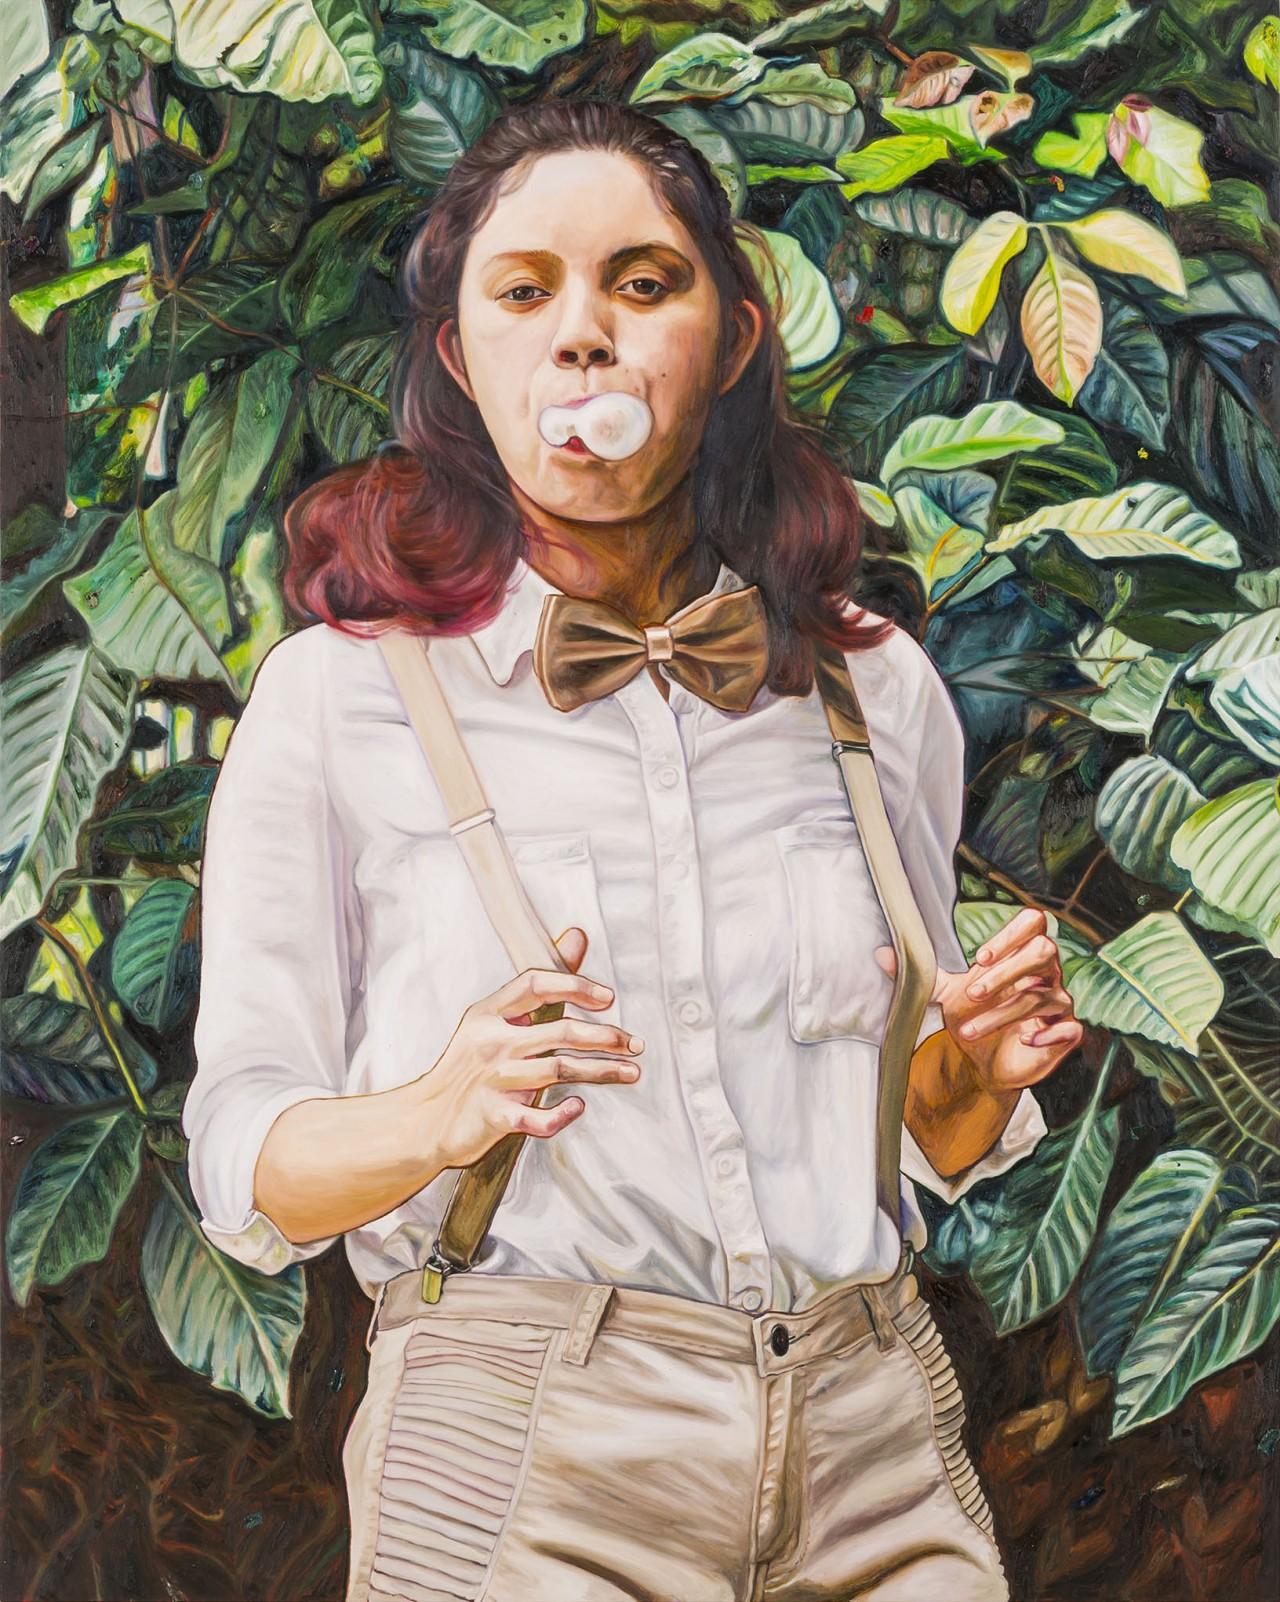 Pintô | Your Door to Philippine Contemporary Art Kiarra Blowing Gum